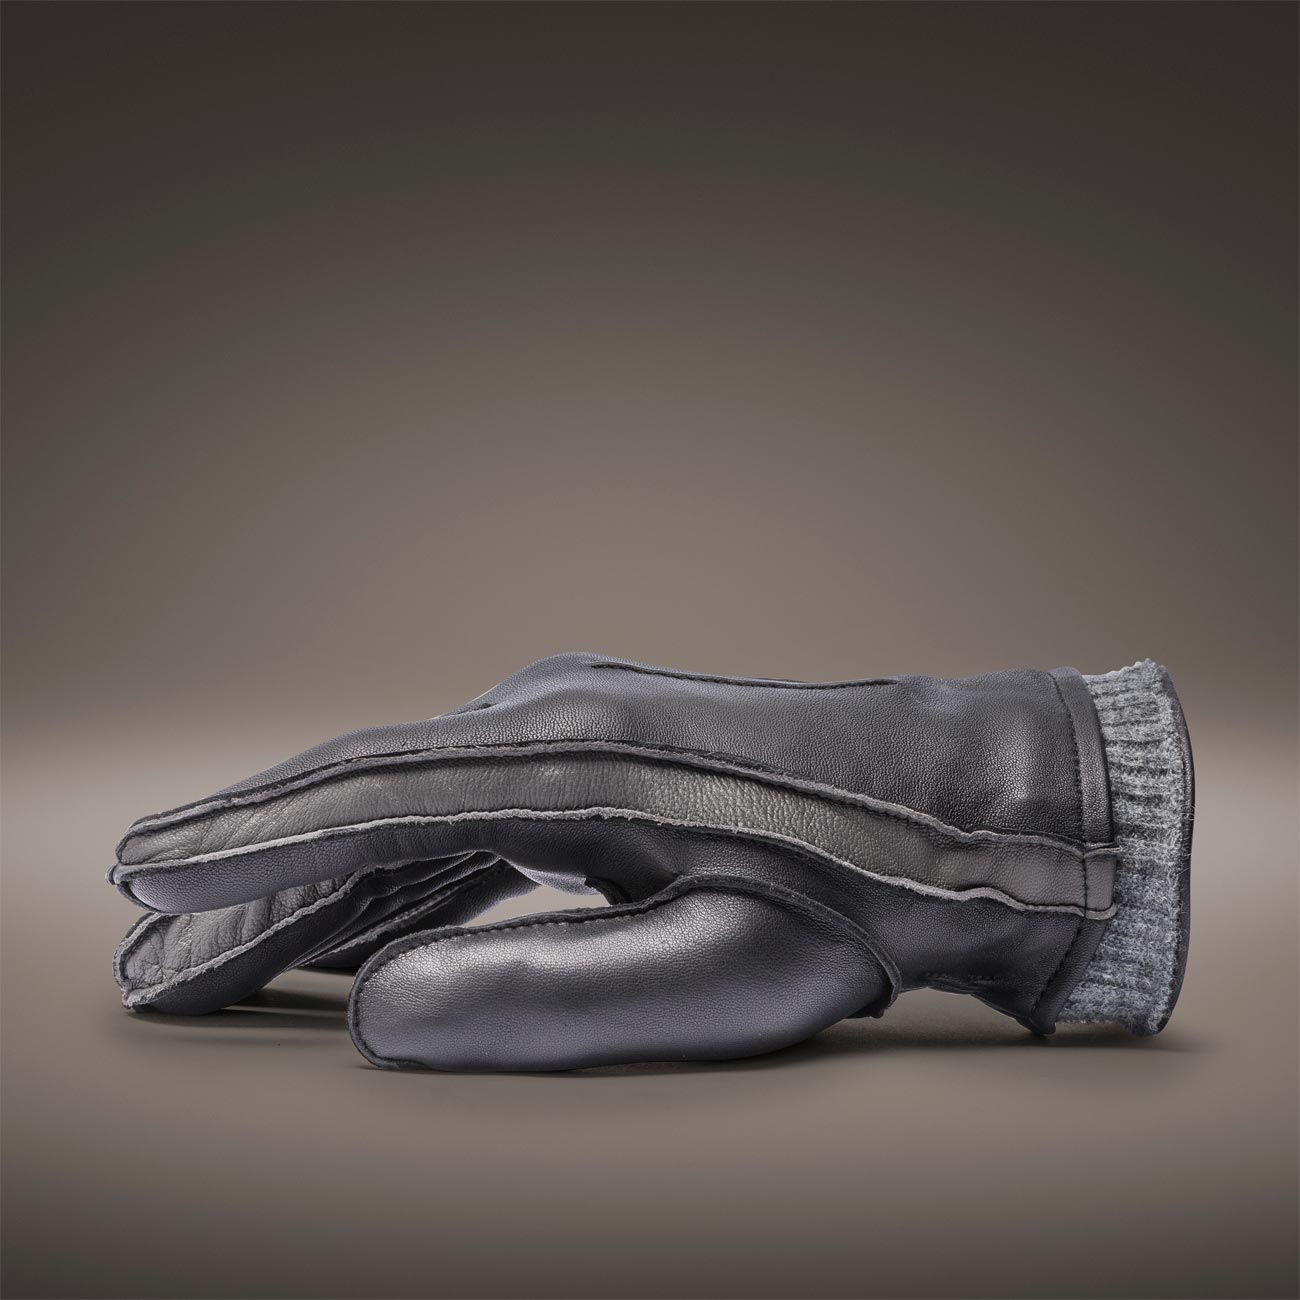 Lieferant hochwertige Handschuhe Produzent